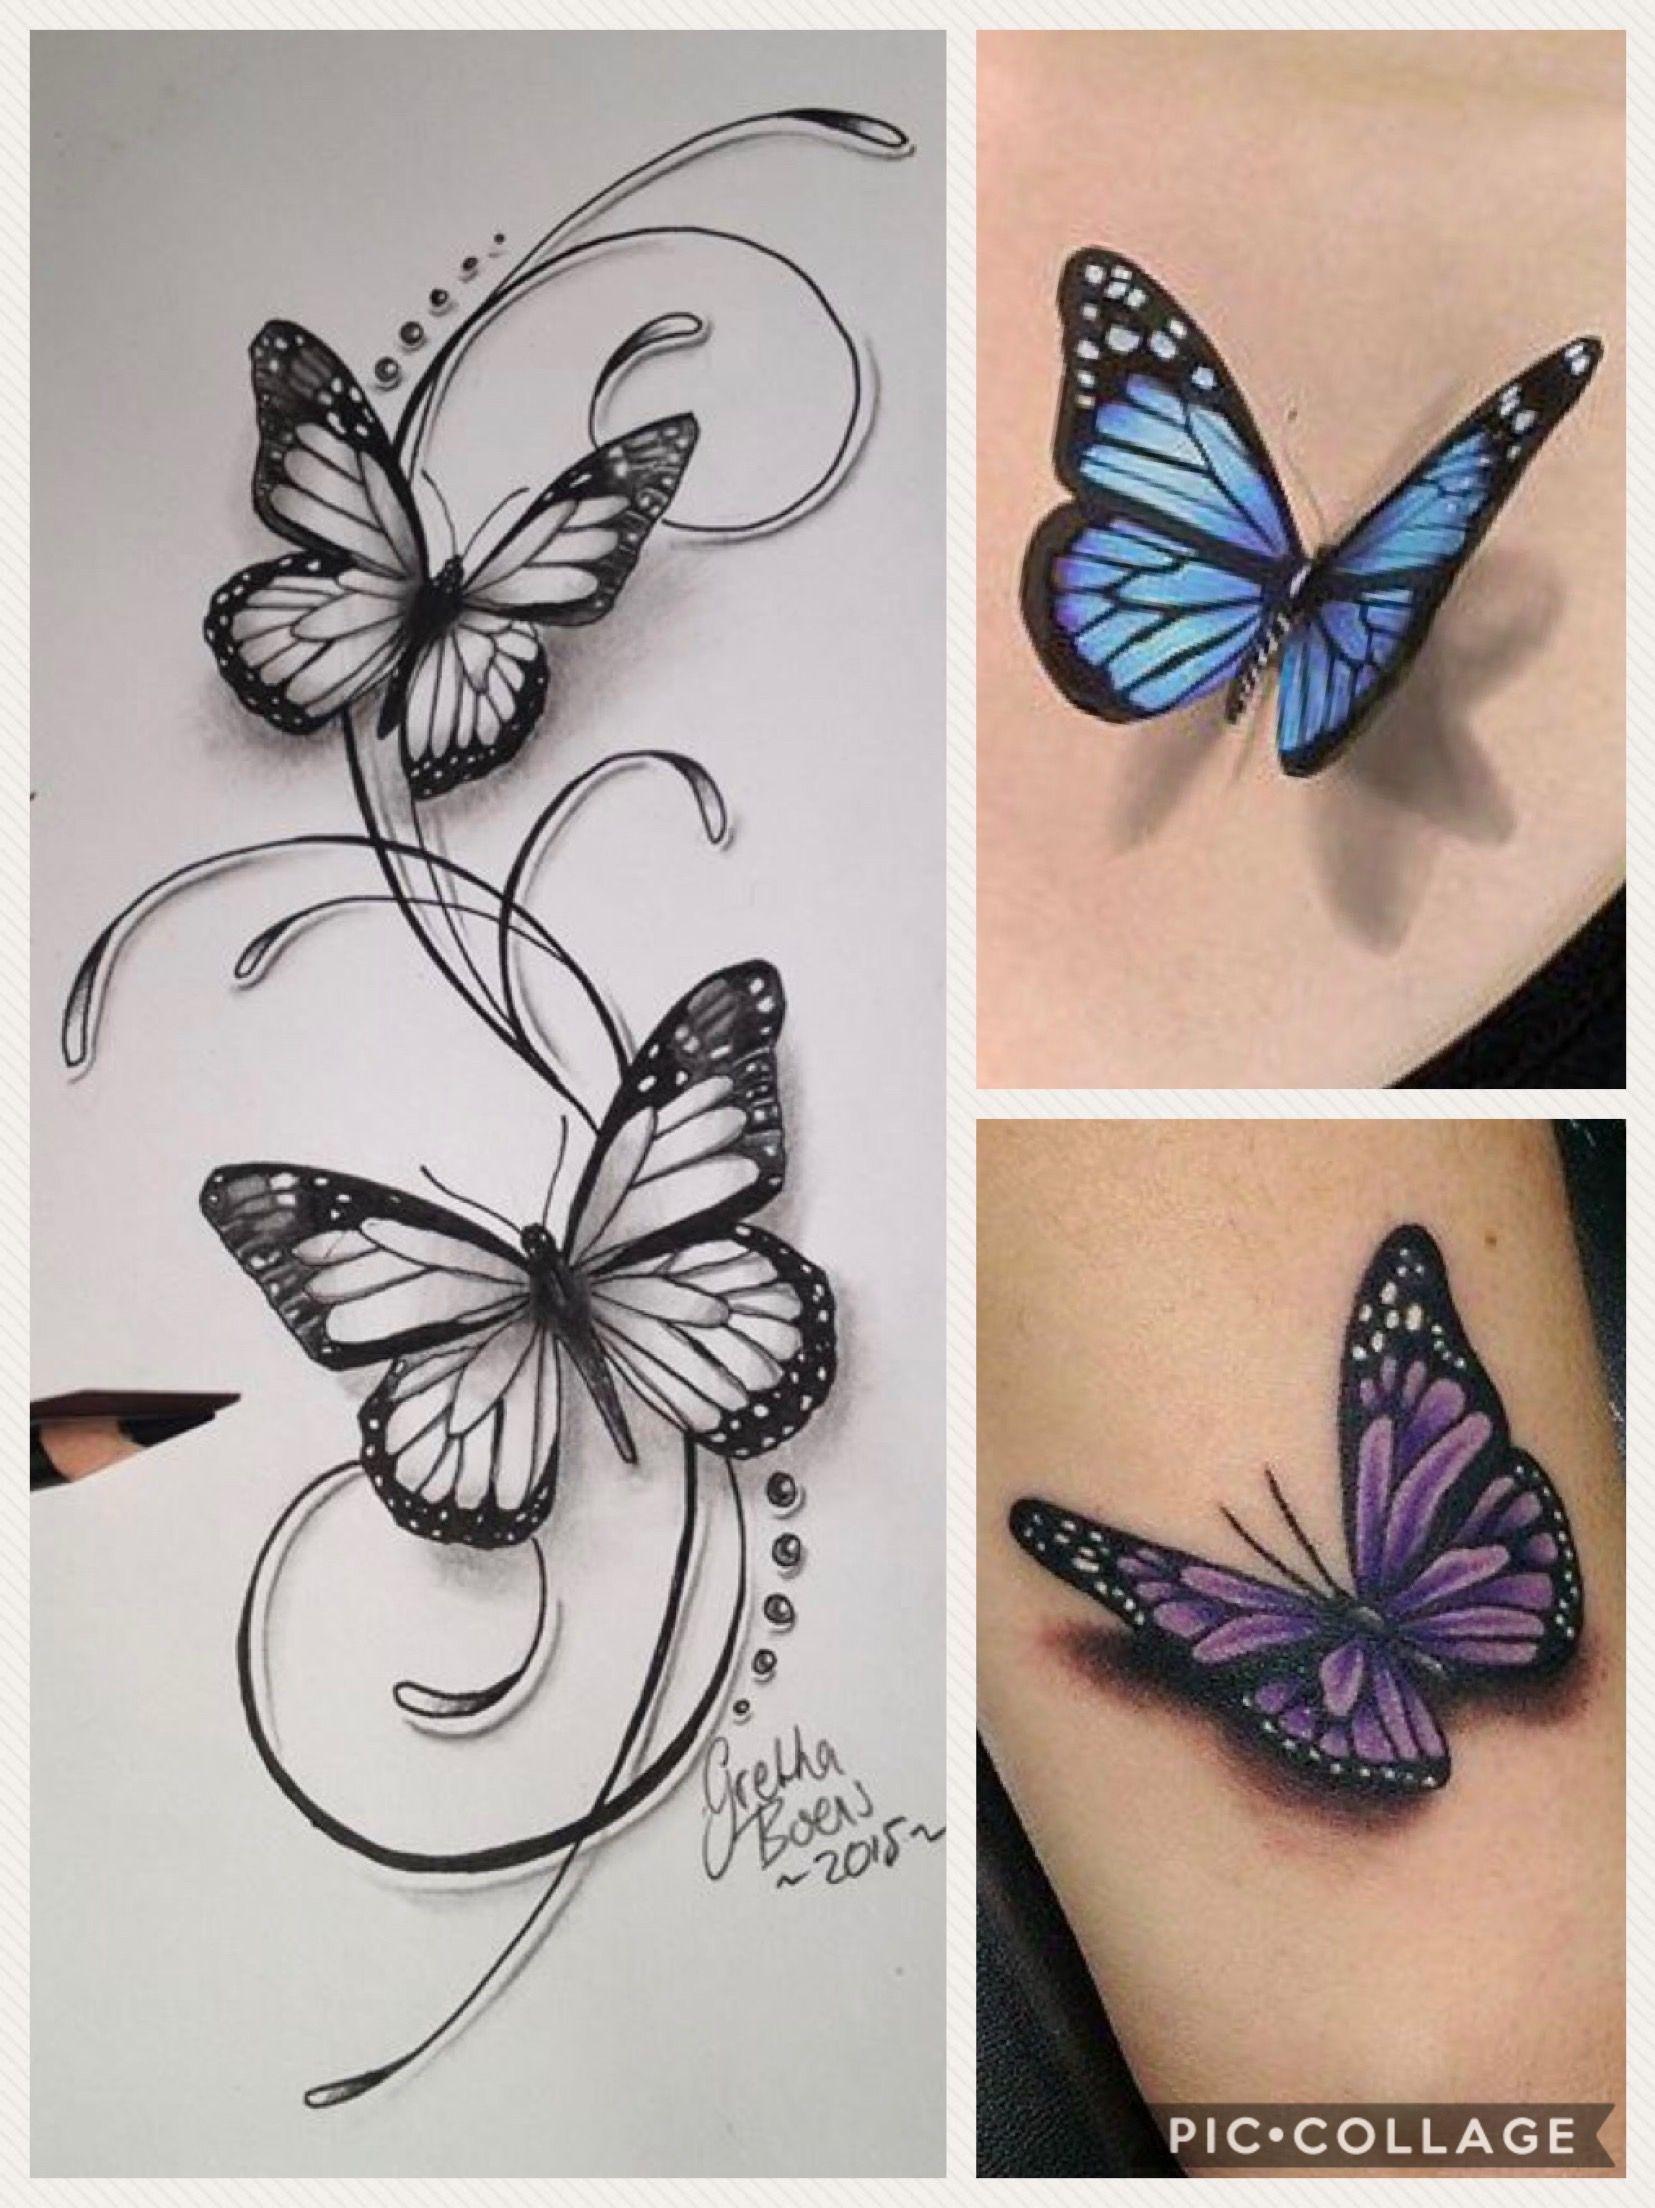 Like That Like That Butterflytattoo Disneytattoo Mandalatattoo Mother Butterfly Tattoos For Women Realistic Butterfly Tattoo Butterfly Tattoo Designs